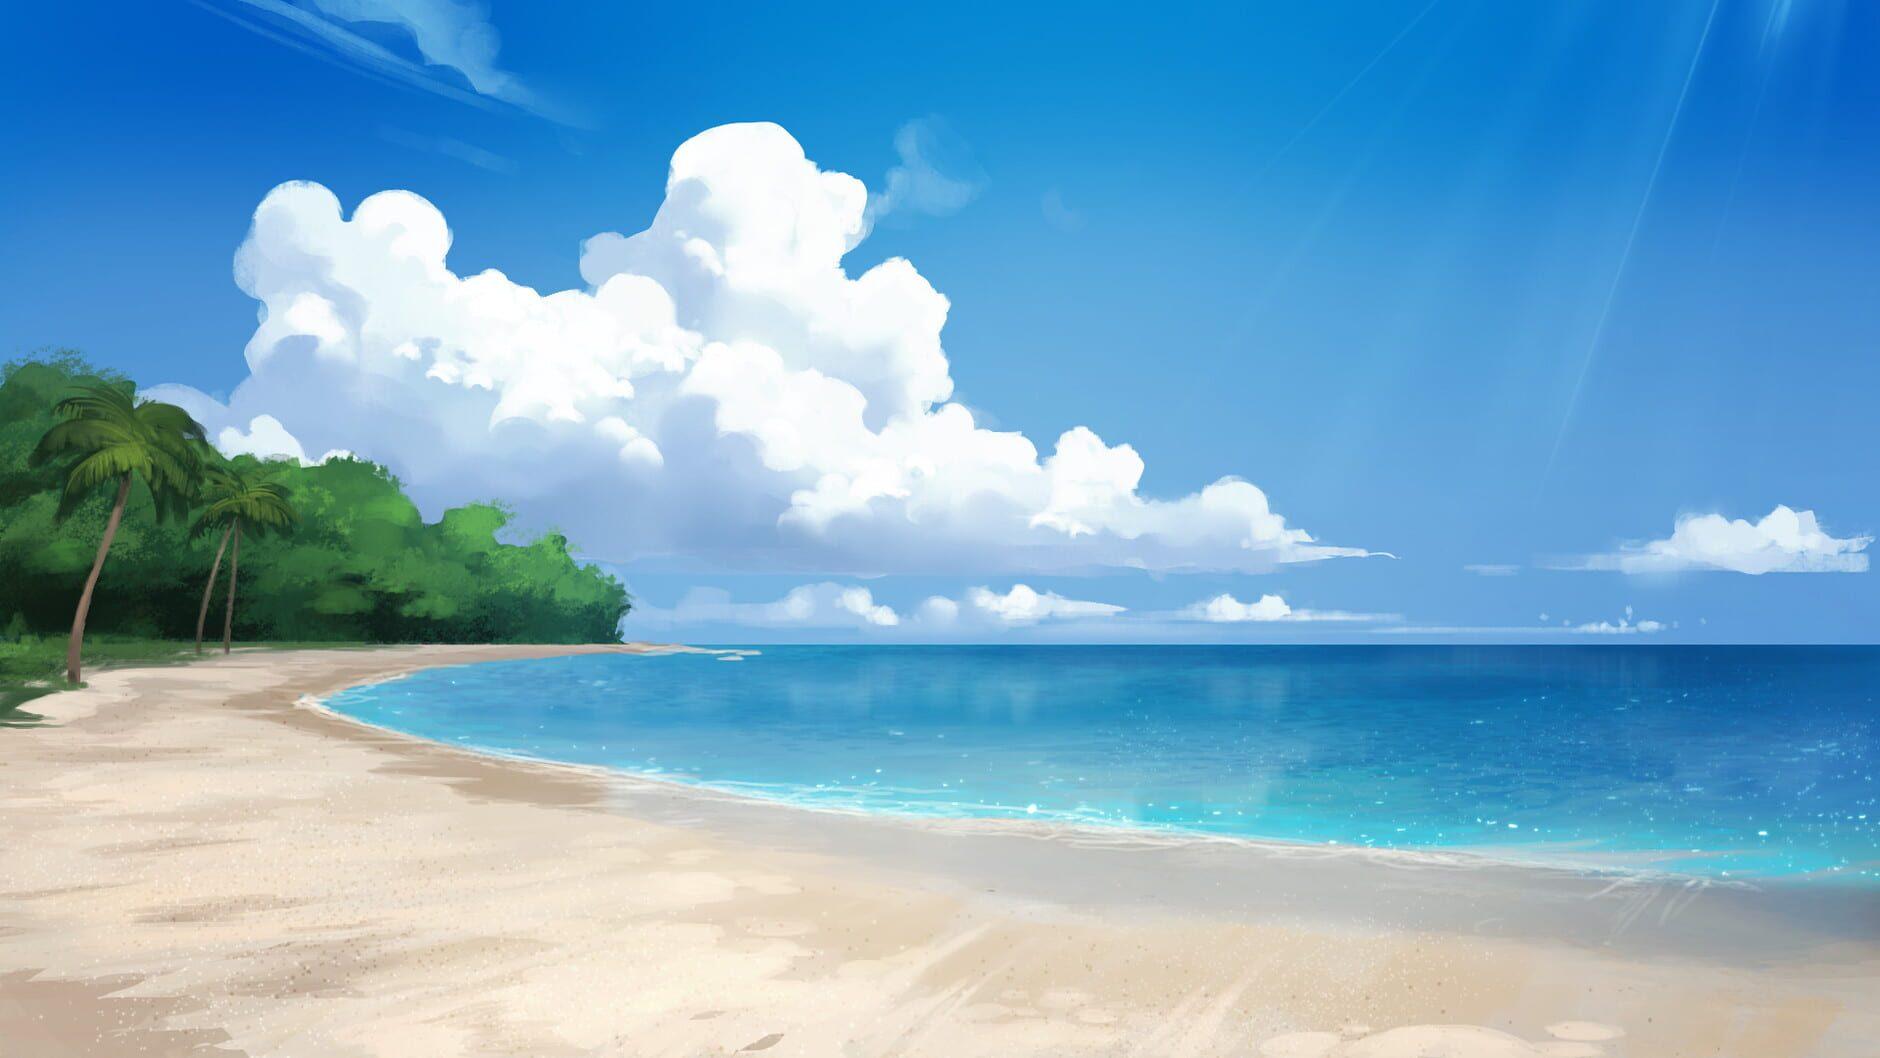 Beach Girls - 4